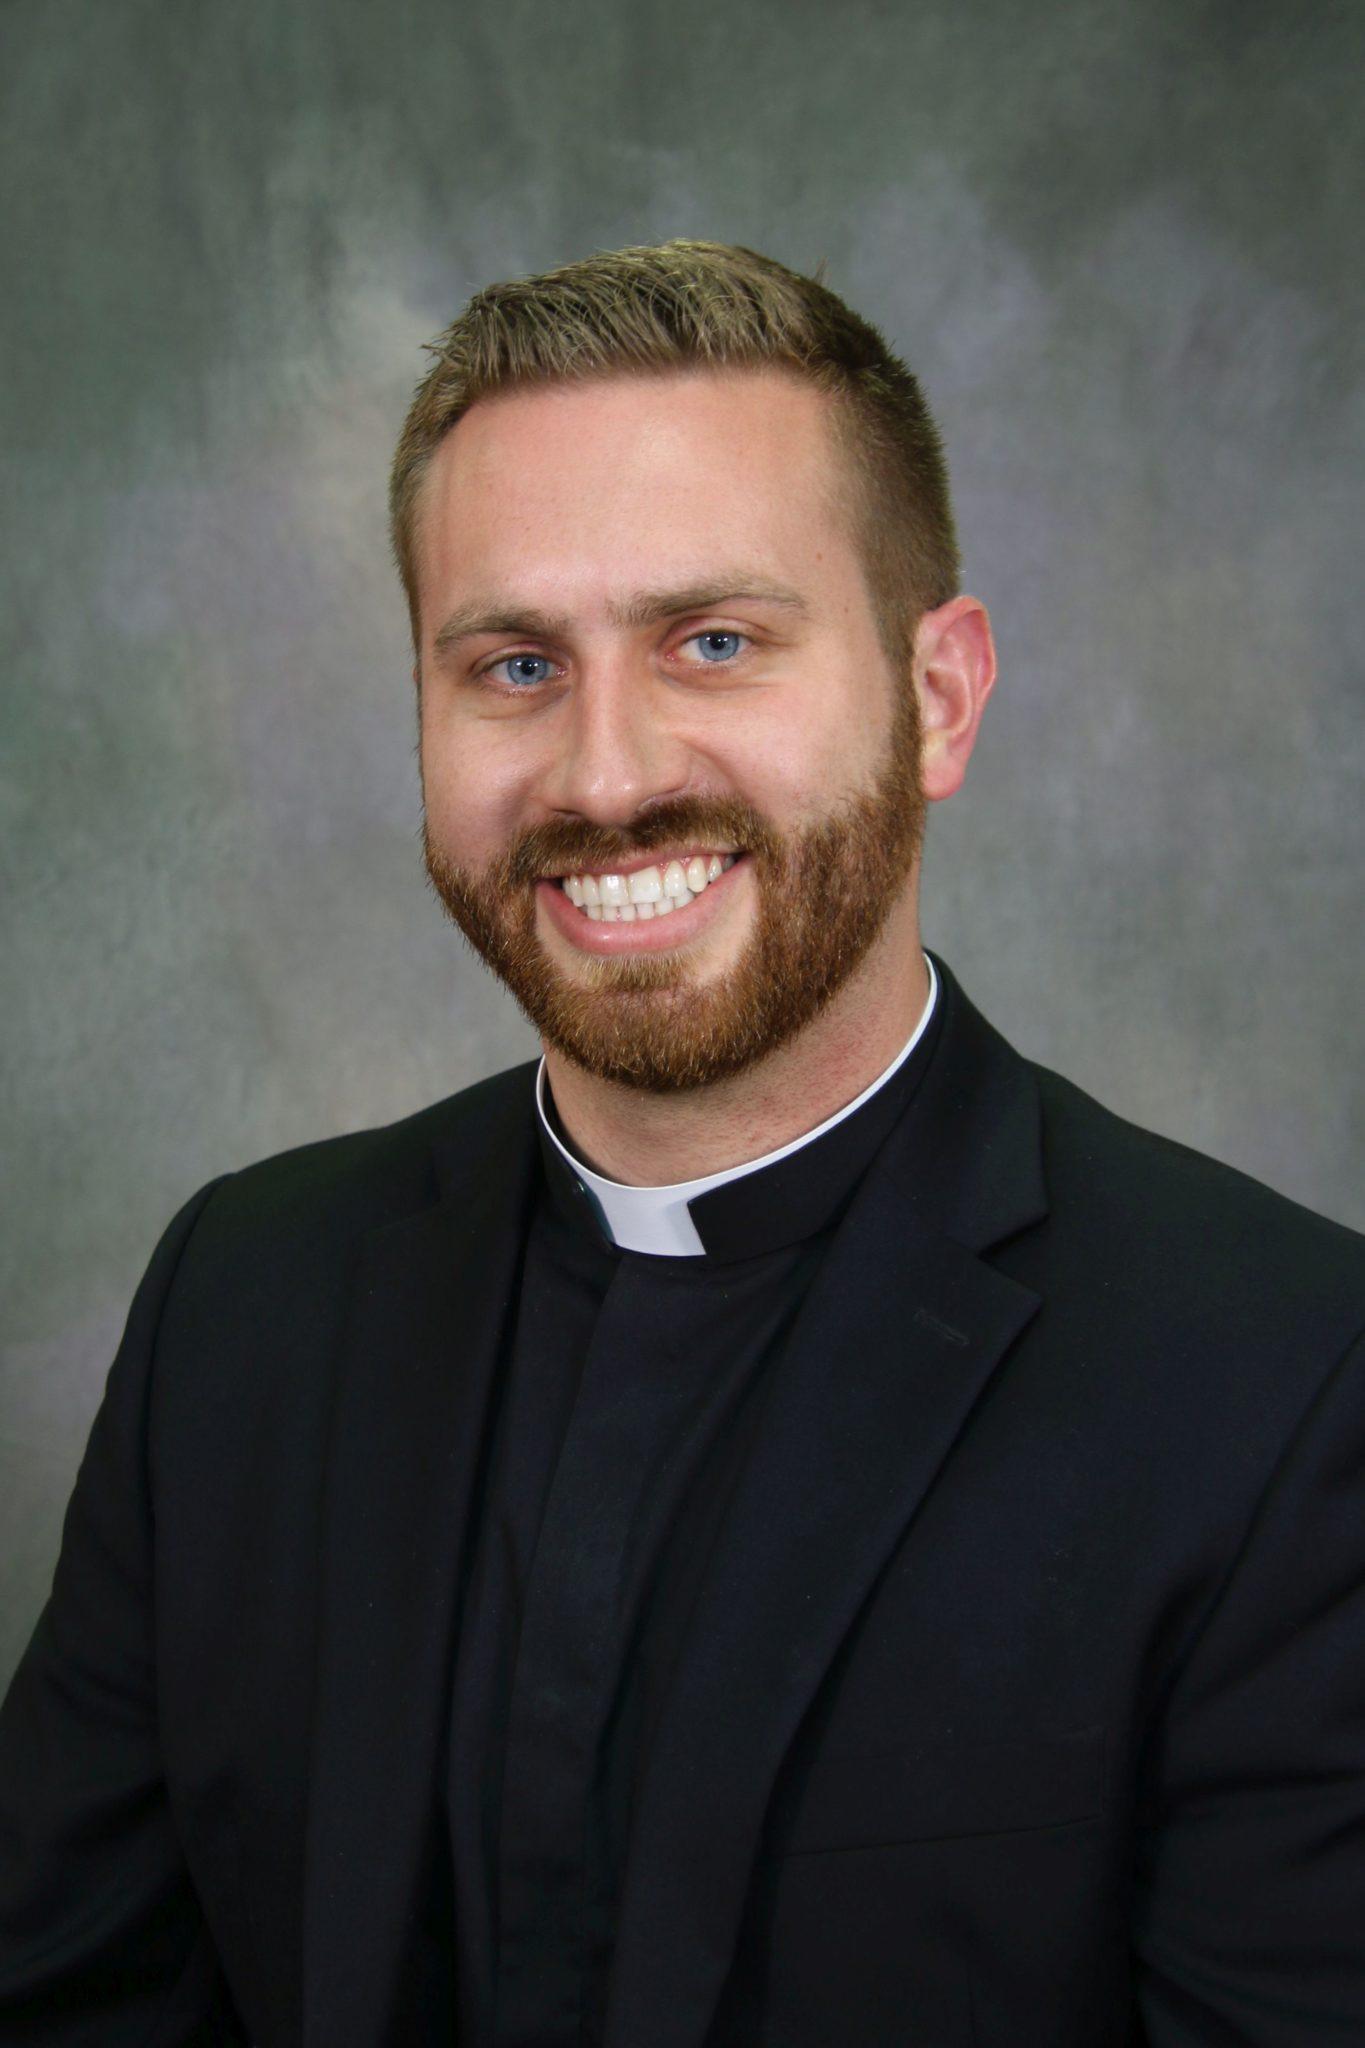 LoCoco, Fr. John